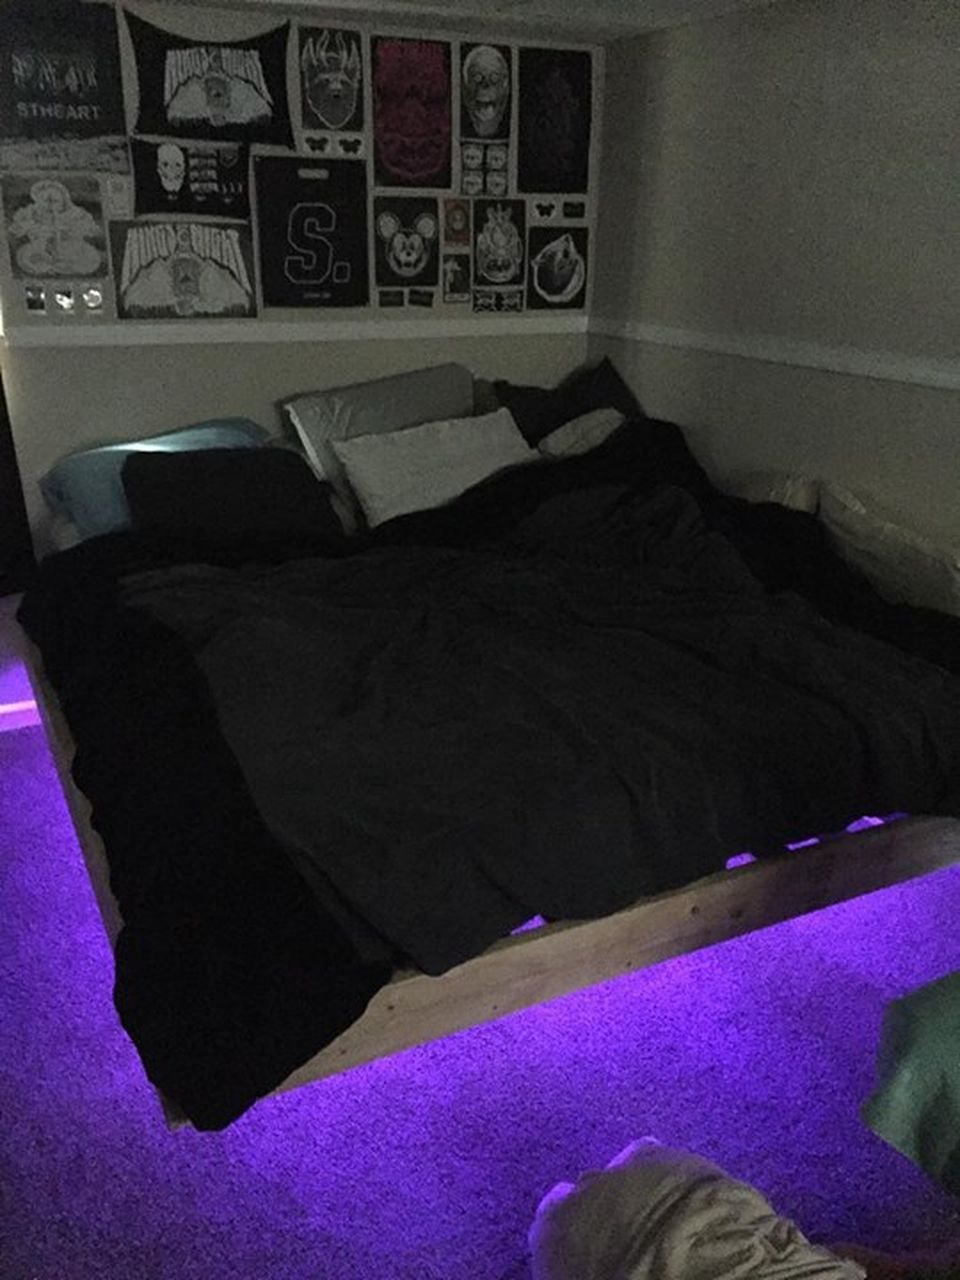 Amazing Modern Floating Bed Design With Under Light Floating Bed Bed With Led Lights Floating Bed Frame